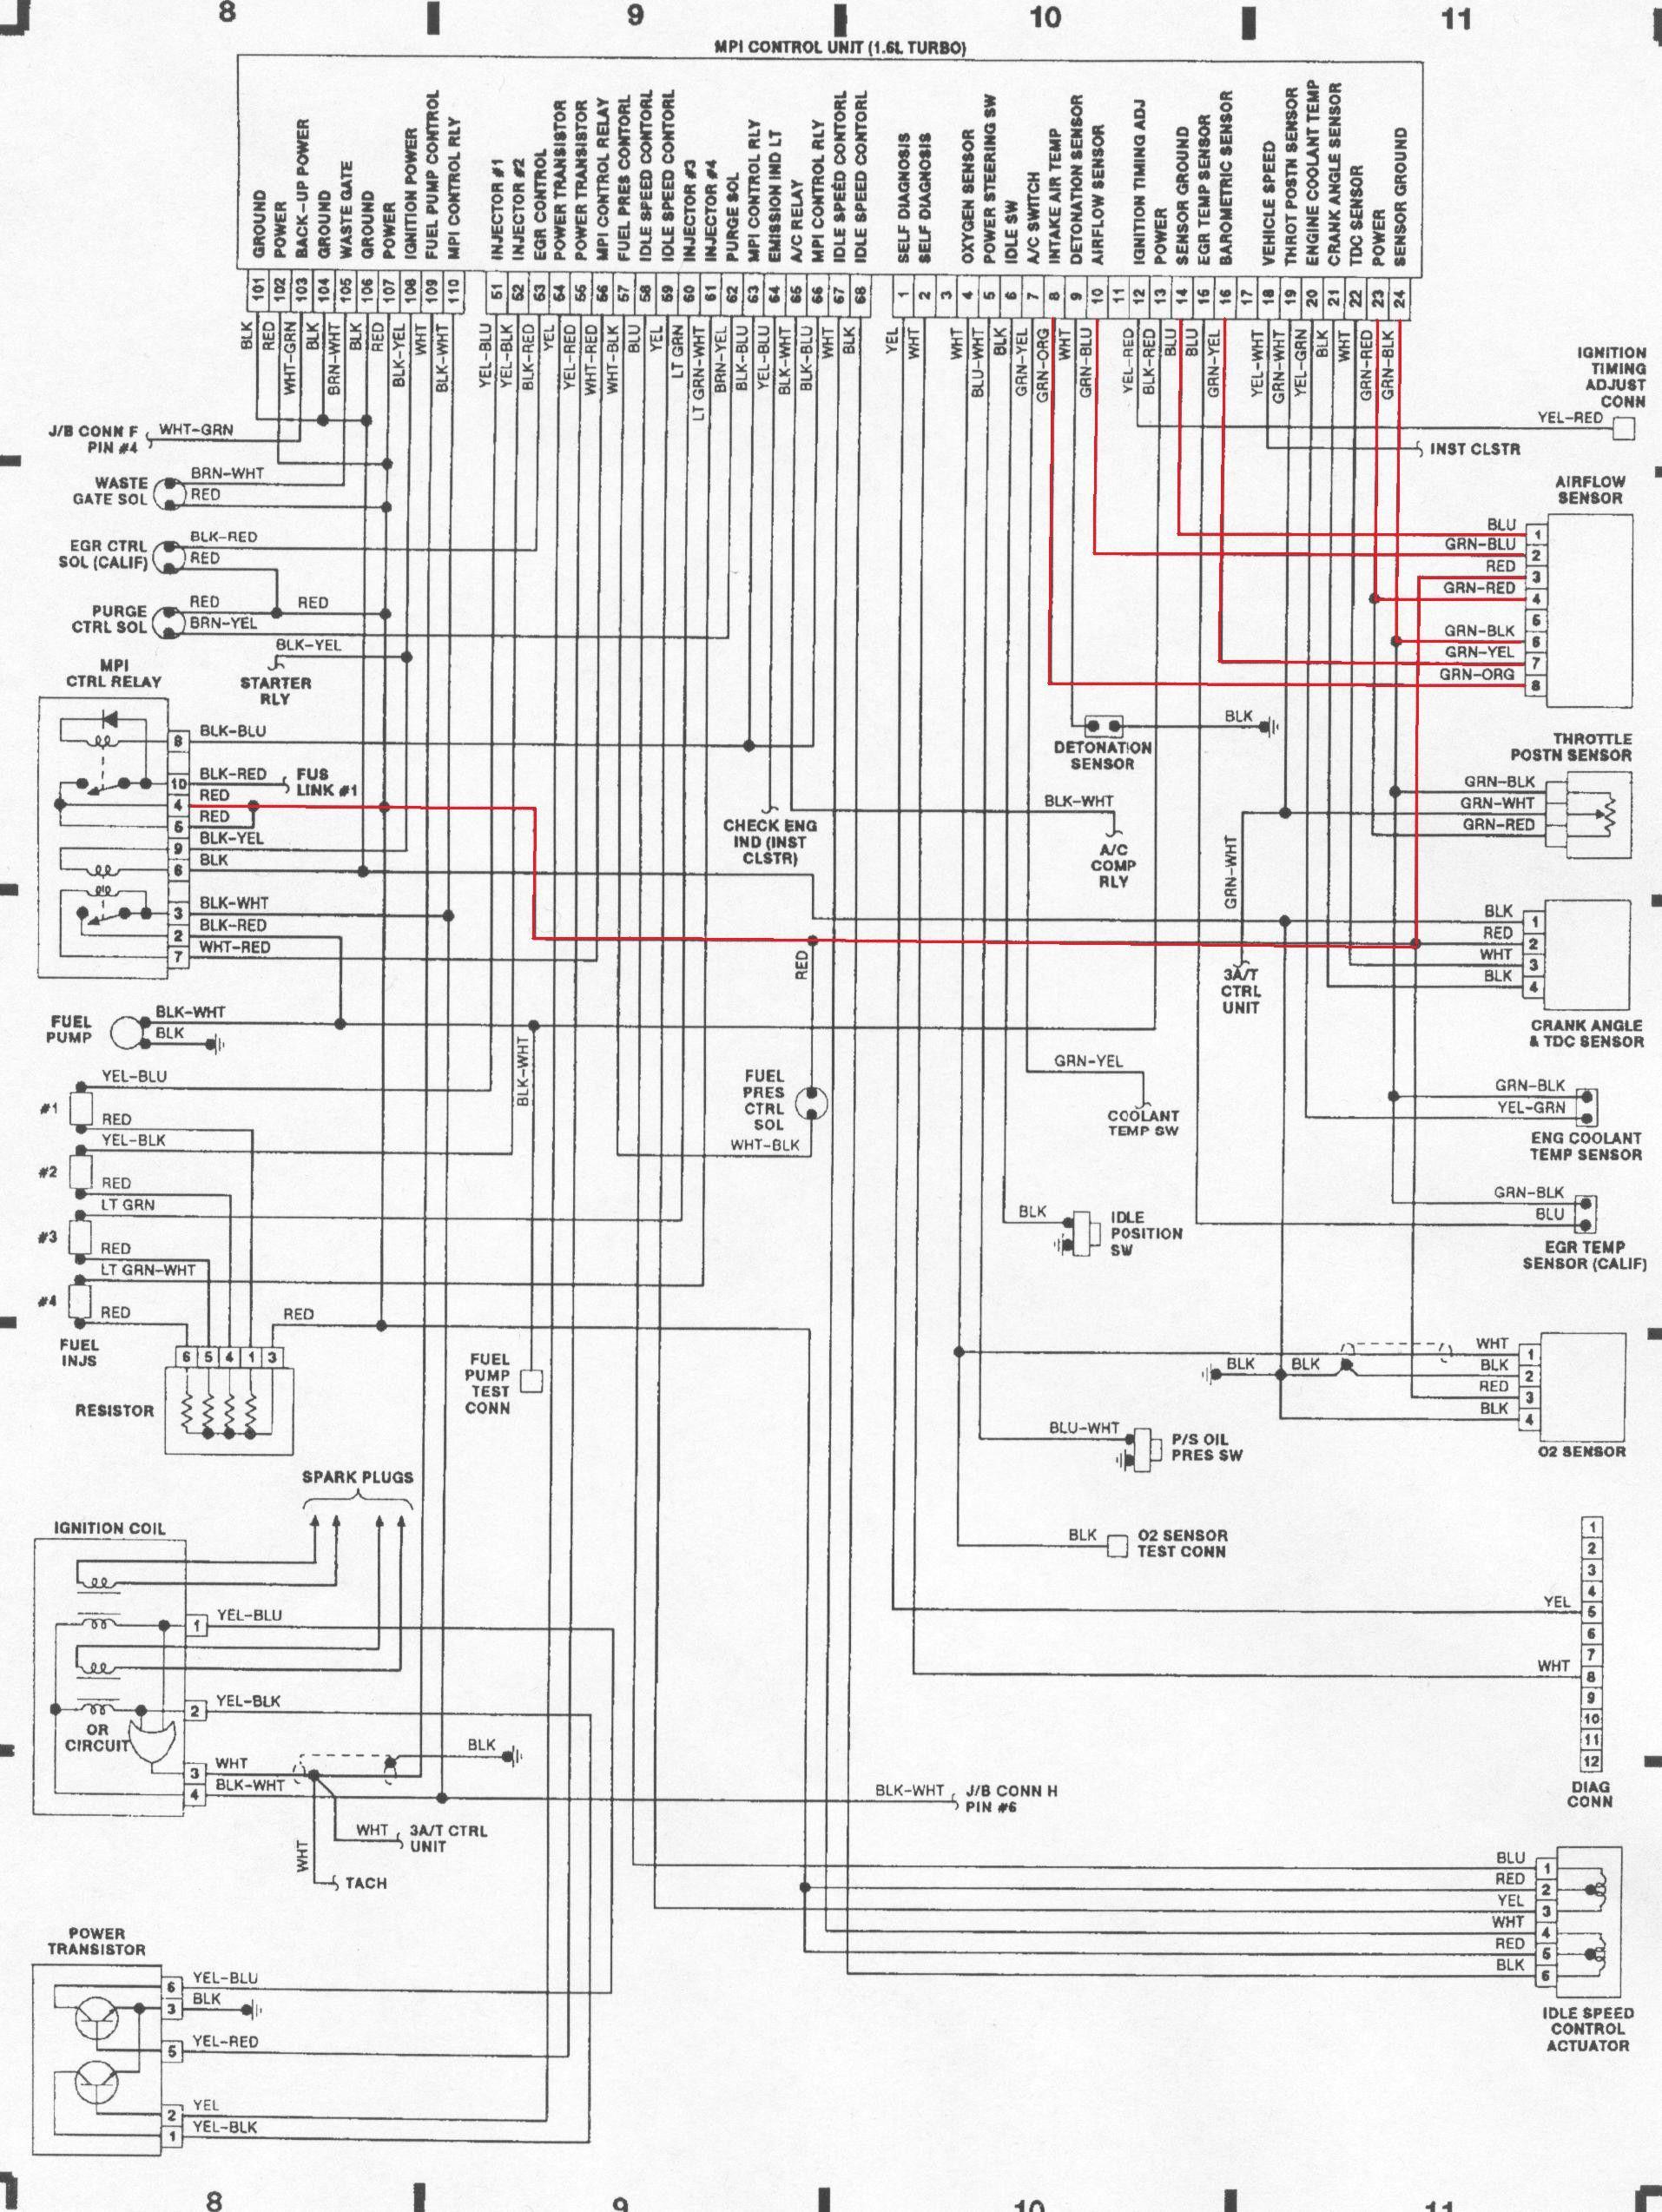 wiring diagram 4g15 pdf virtual fretboard inside mitsubishi